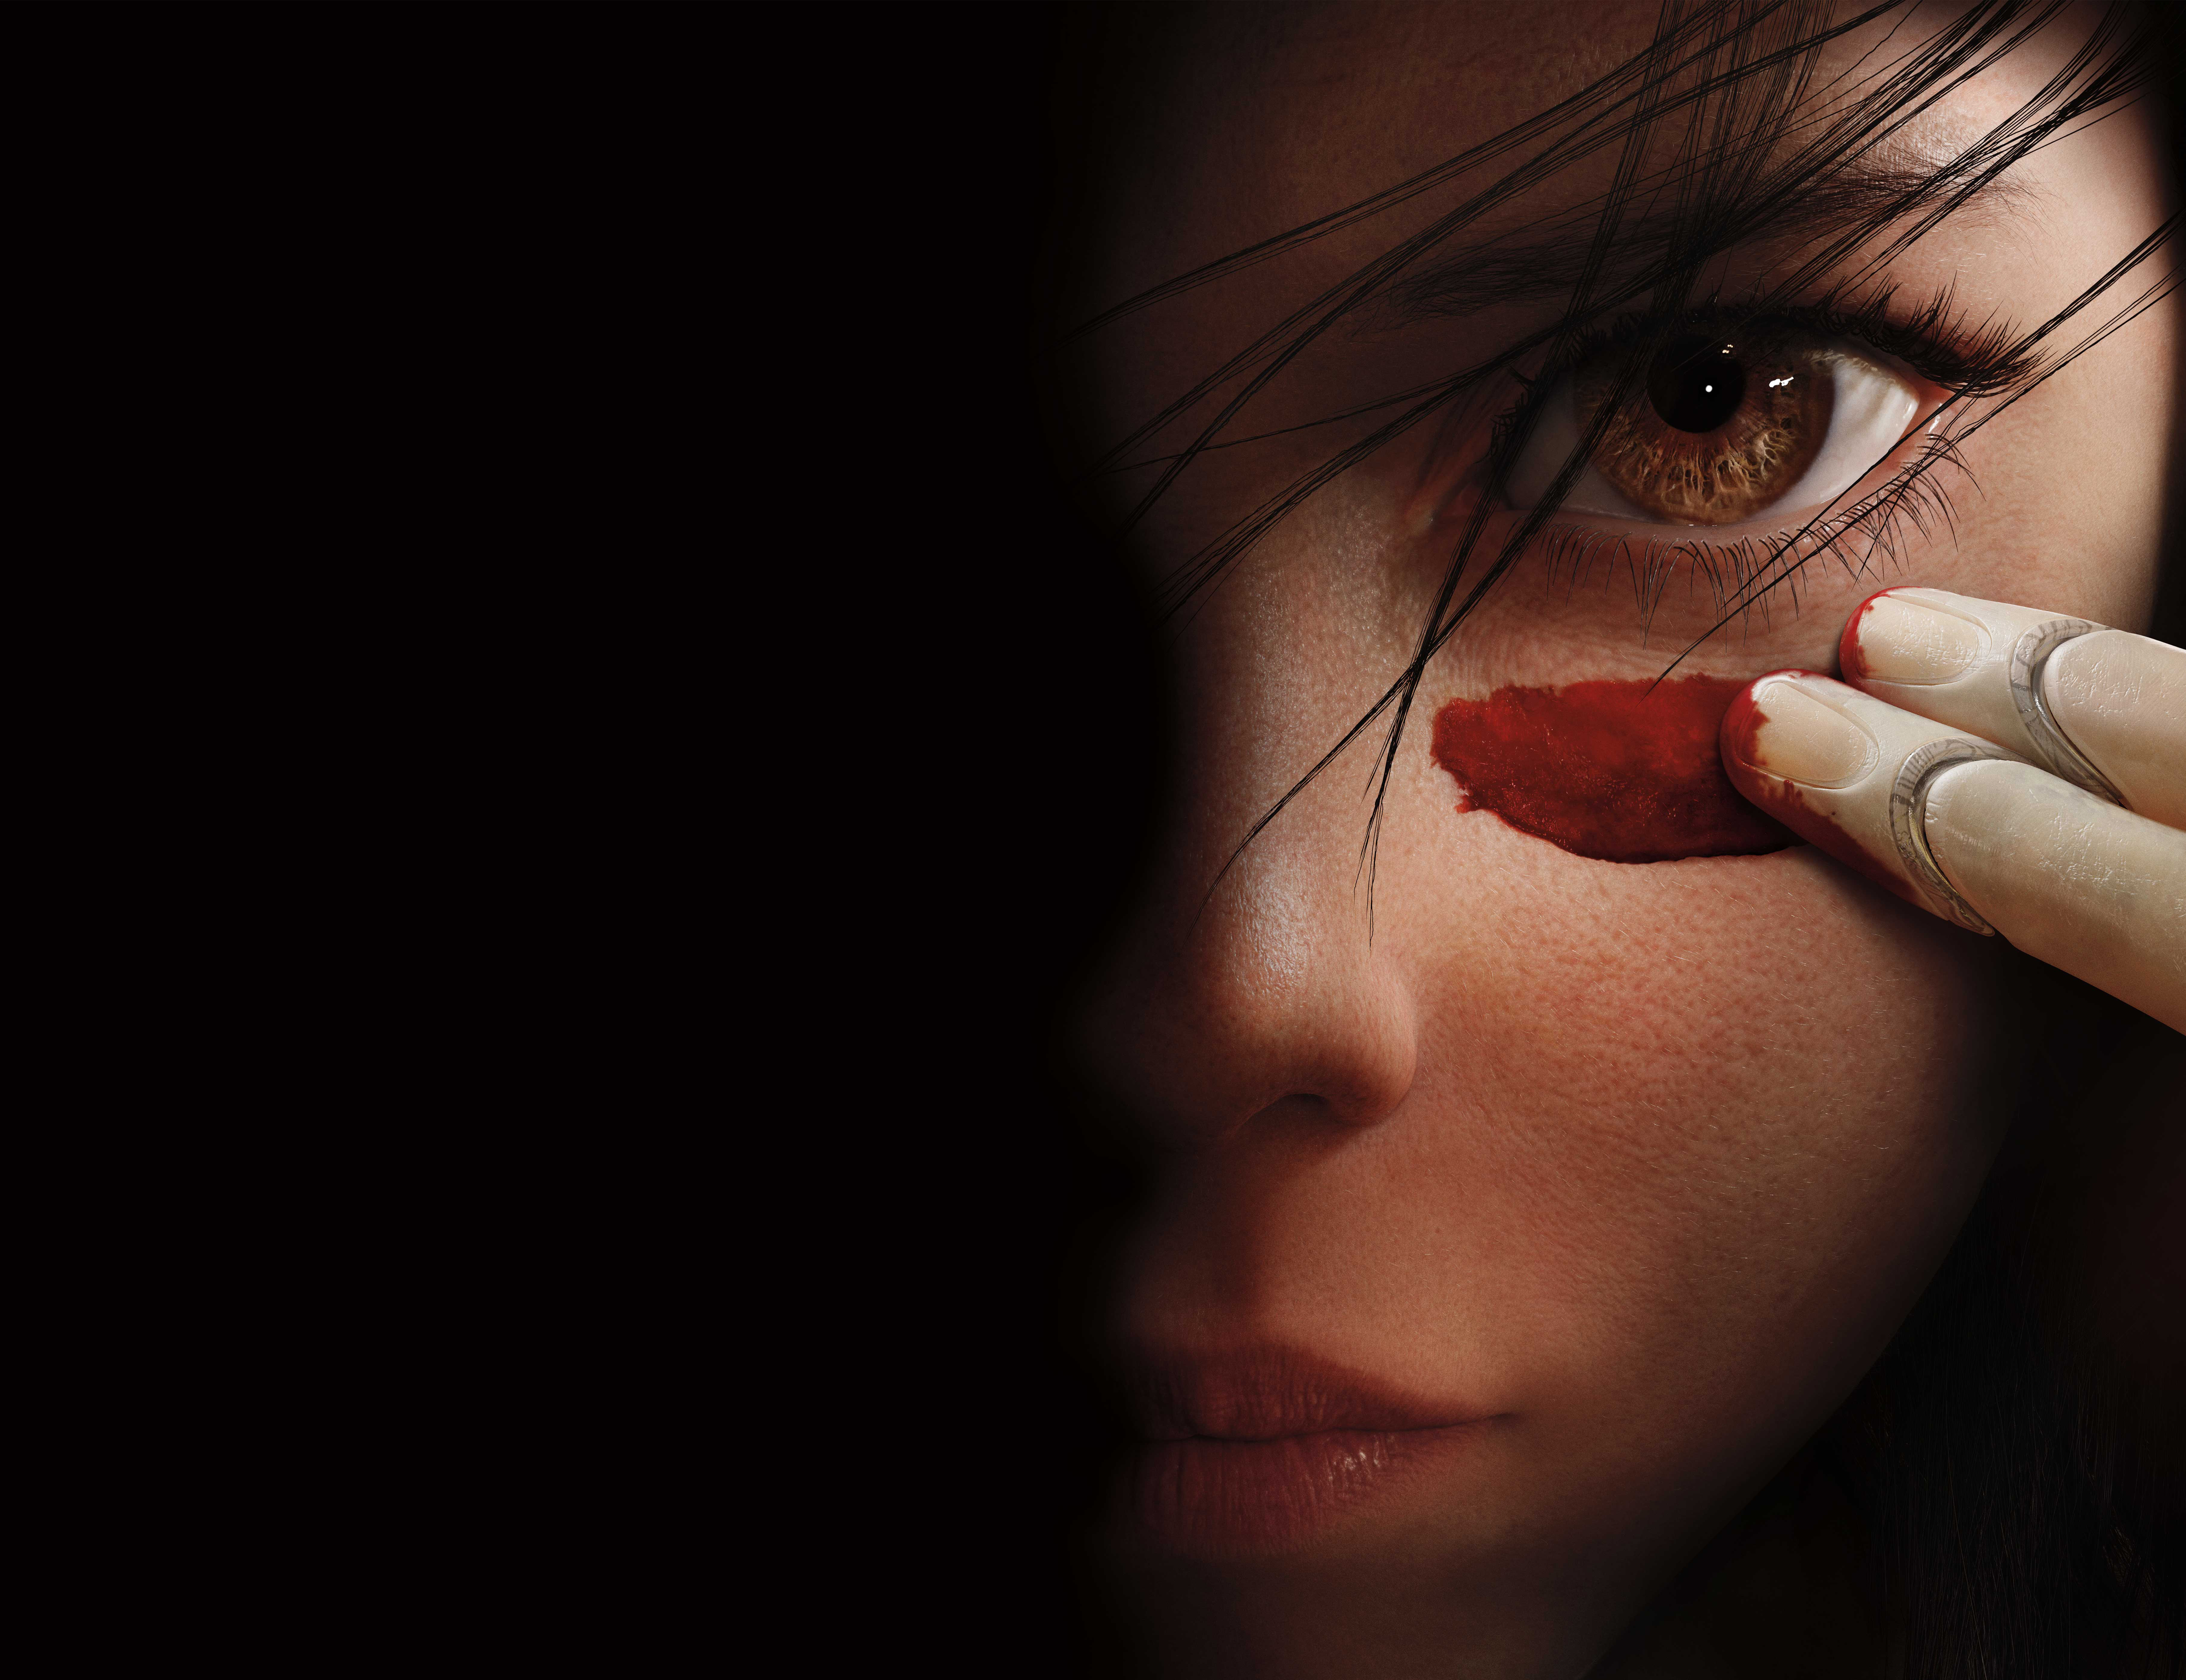 Alita Battle Angel 8k, HD Movies, 4k Wallpapers, Images ...